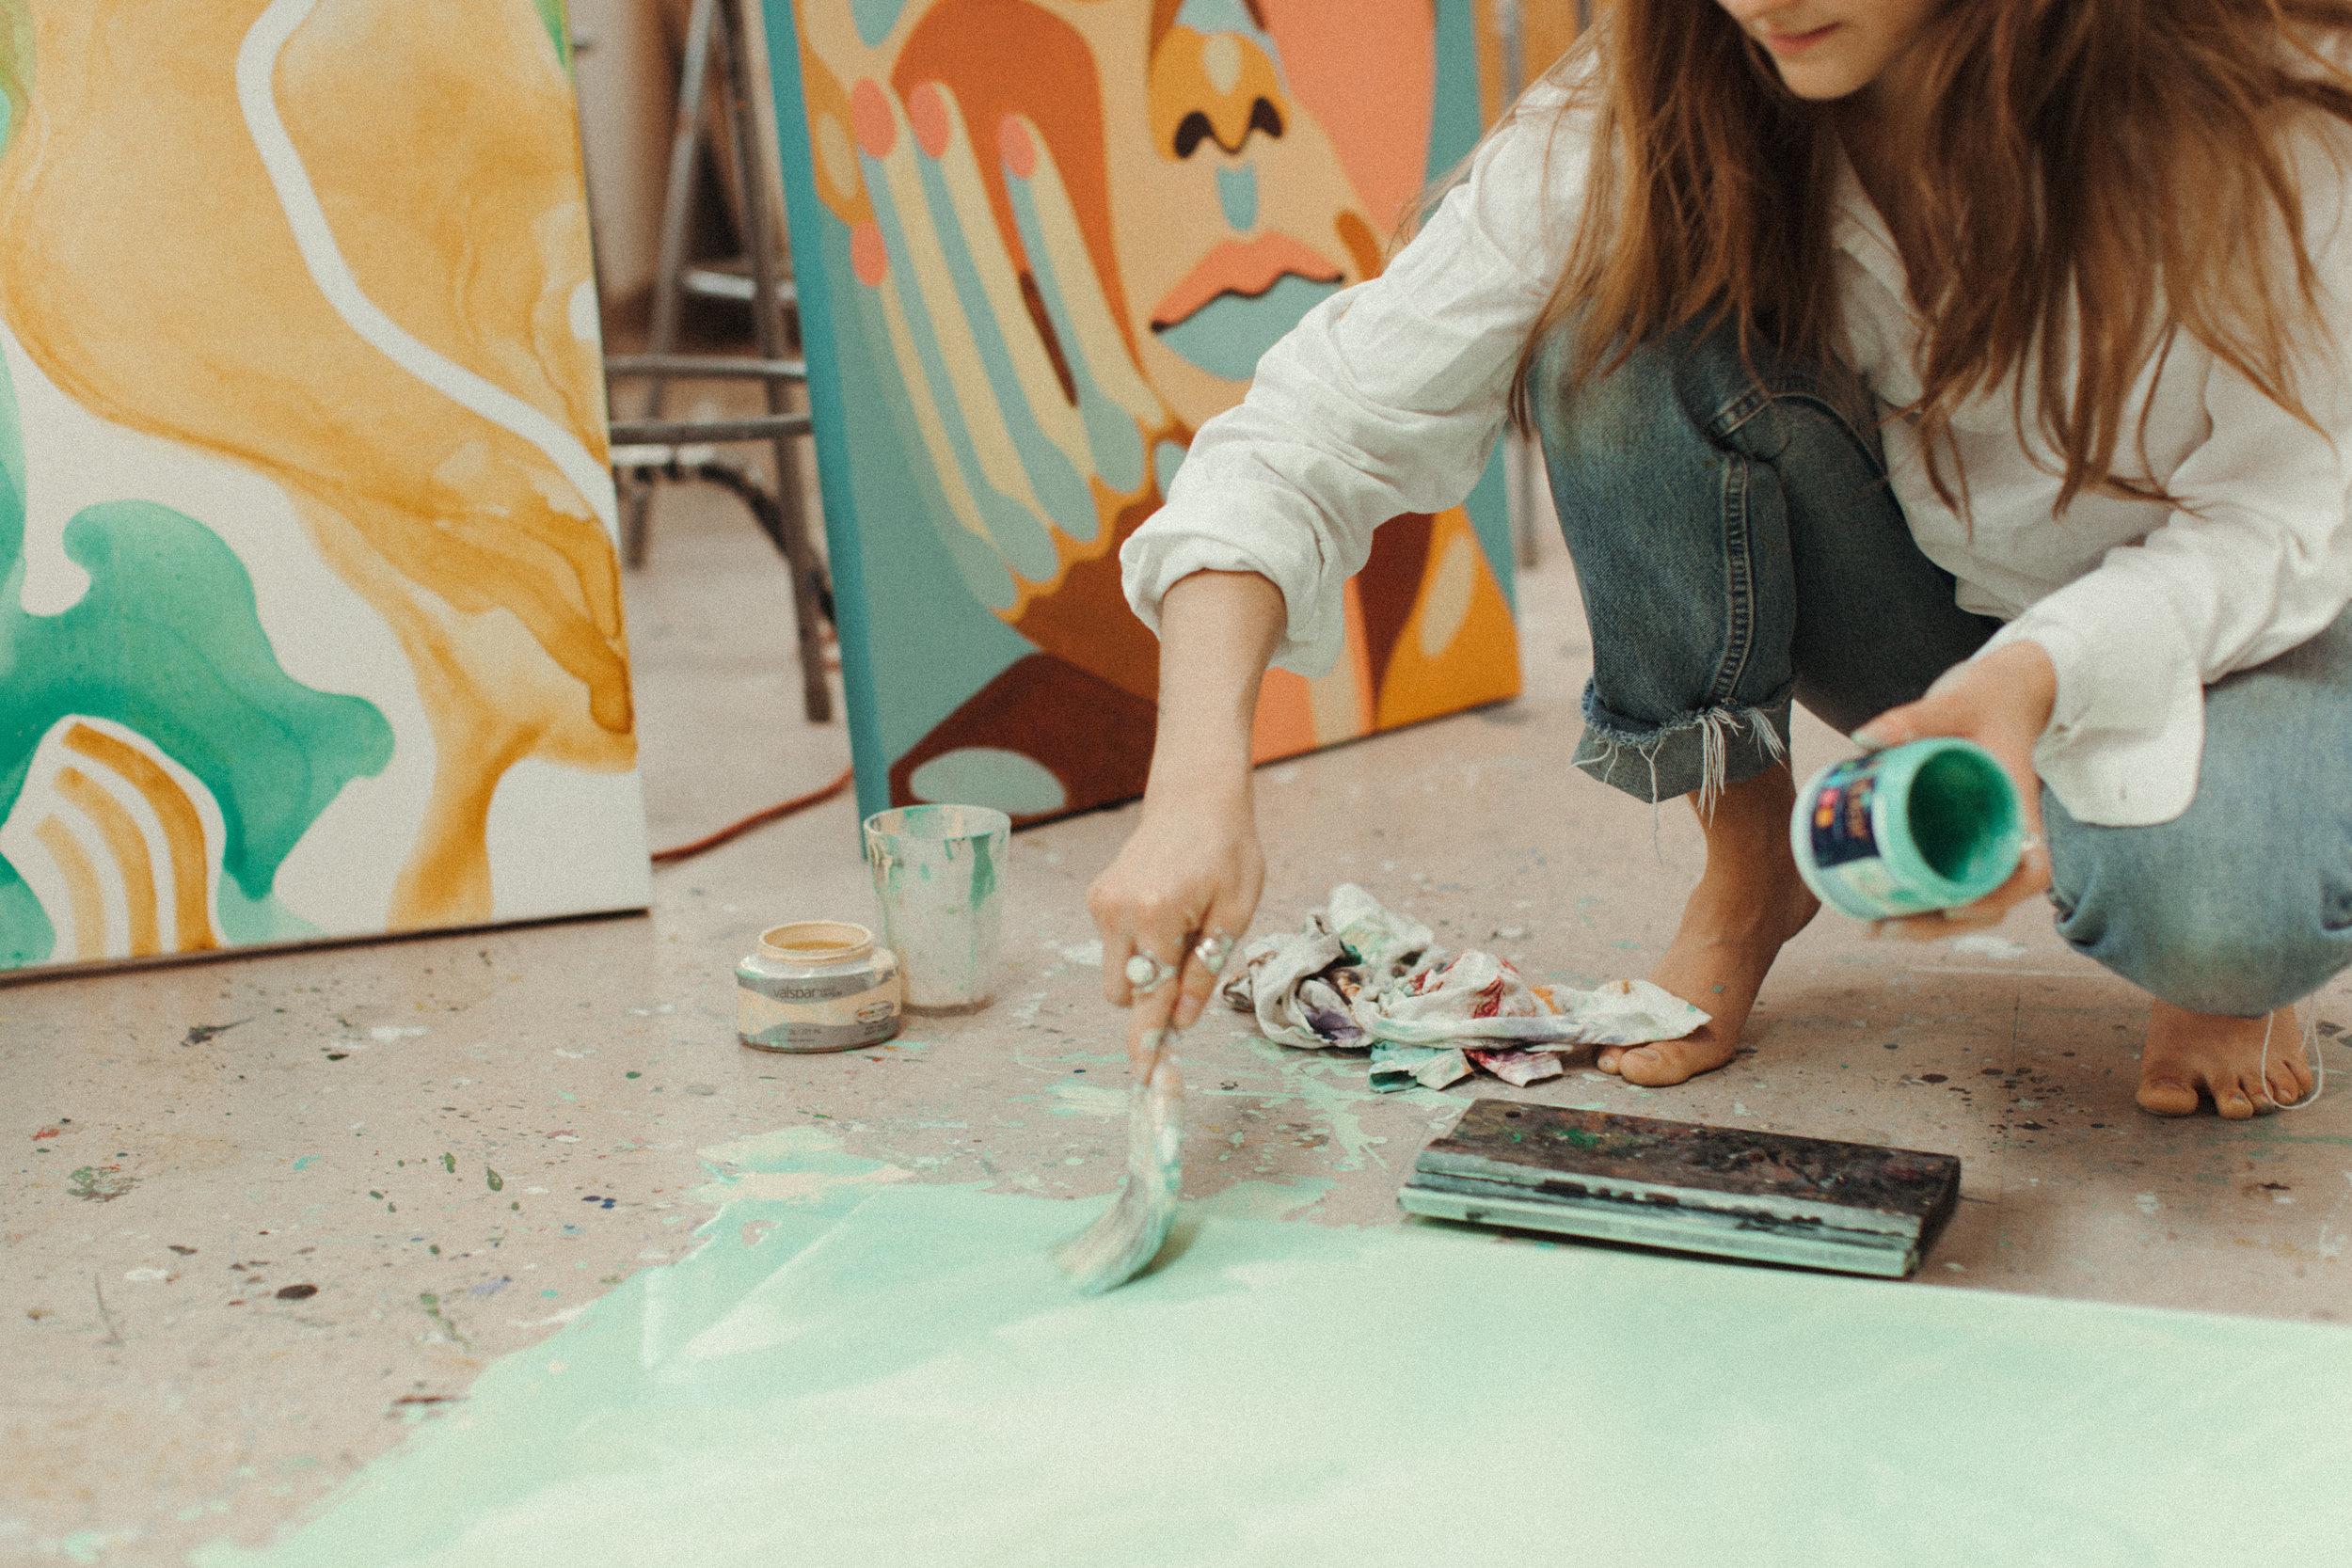 emily-pawlica-art-process-2019-peytoncurry-0532.jpg